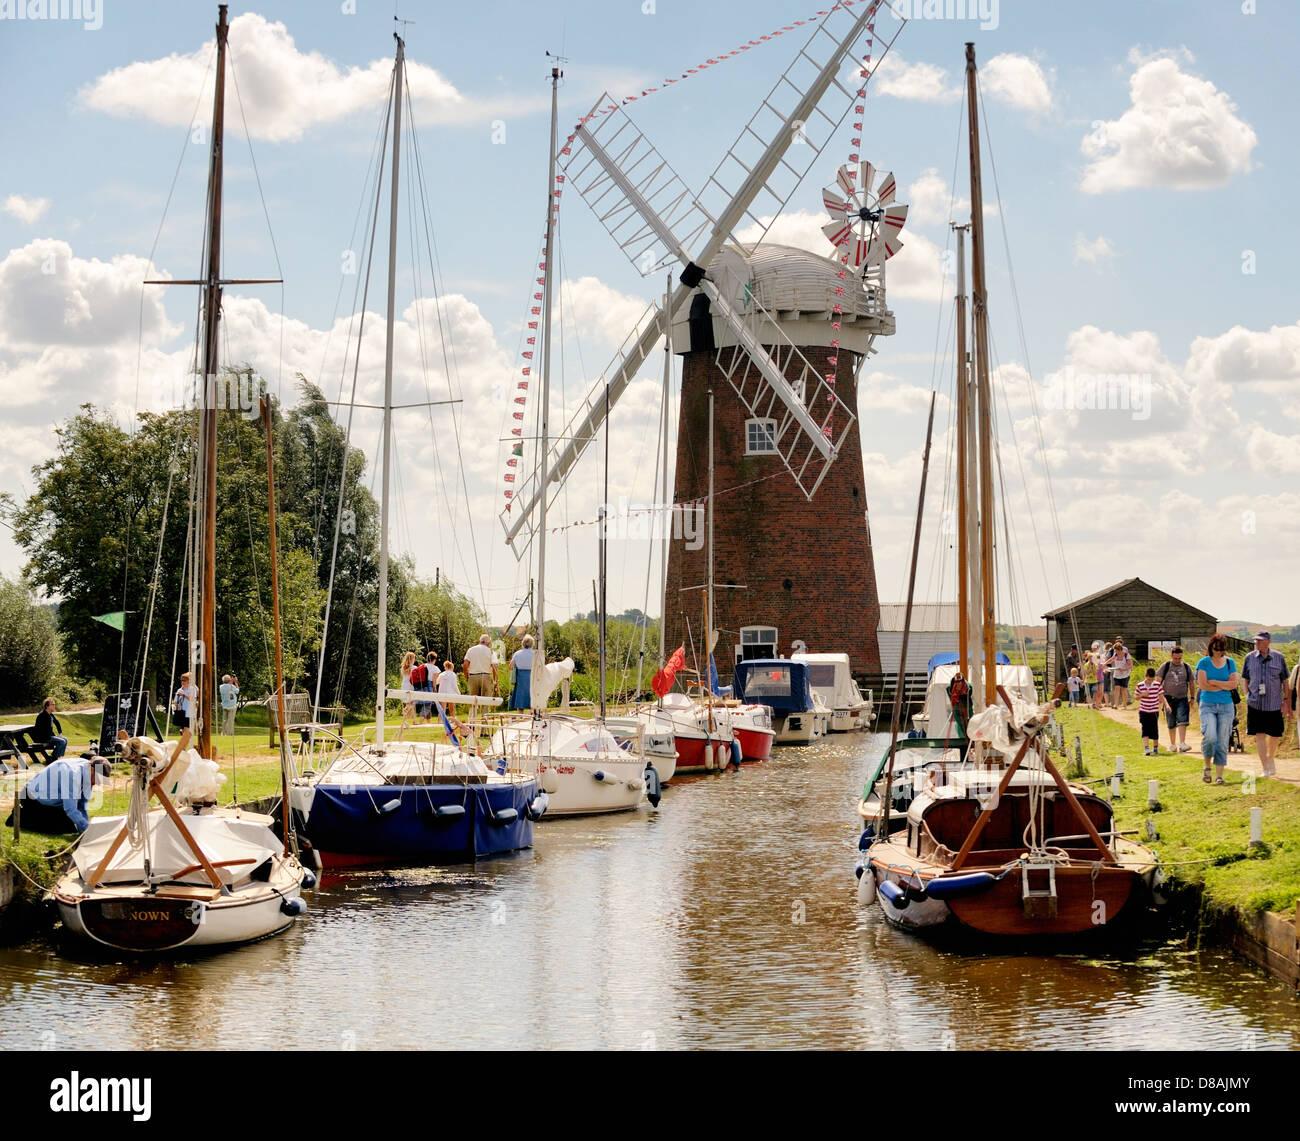 Horsey windpump drainage windmill near Great Yarmouth, Norfolk, England. Pleasure boats at Horsey Mere. Summer - Stock Image